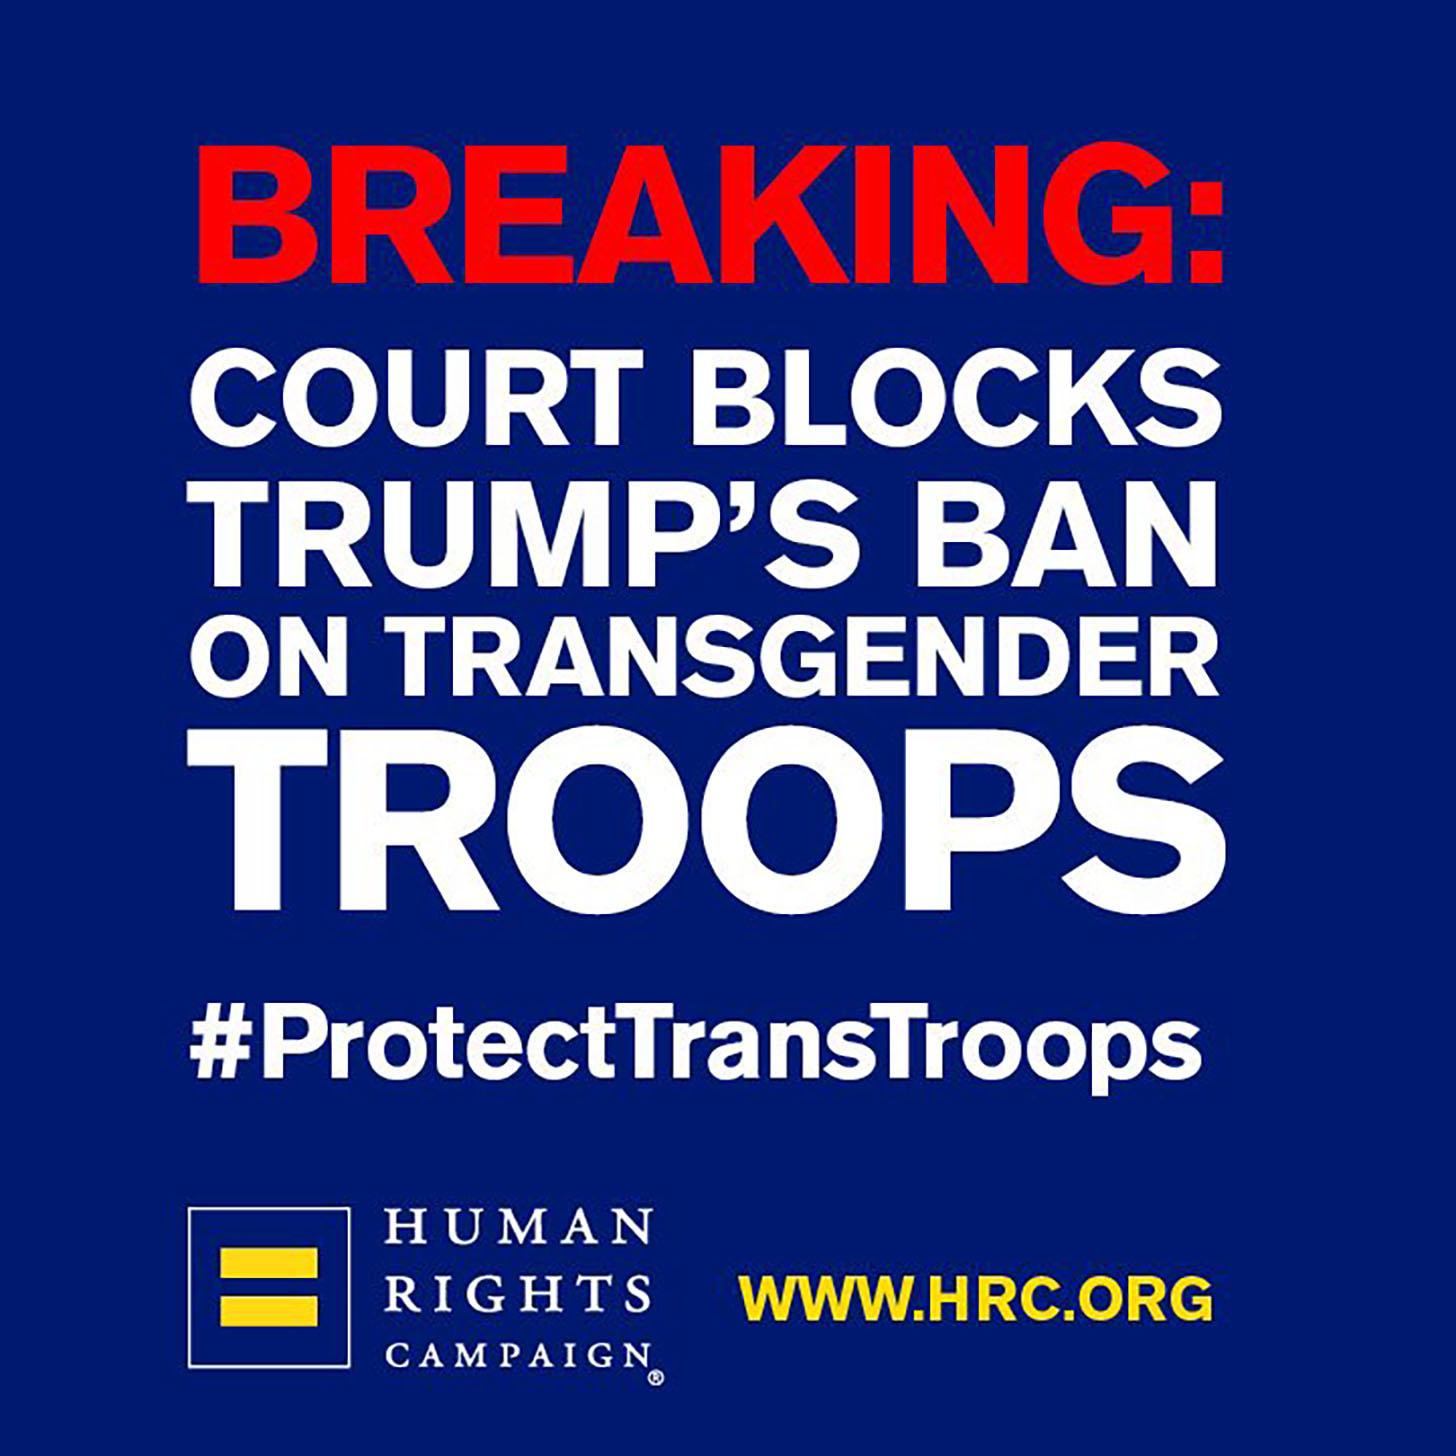 HRC Twitter post